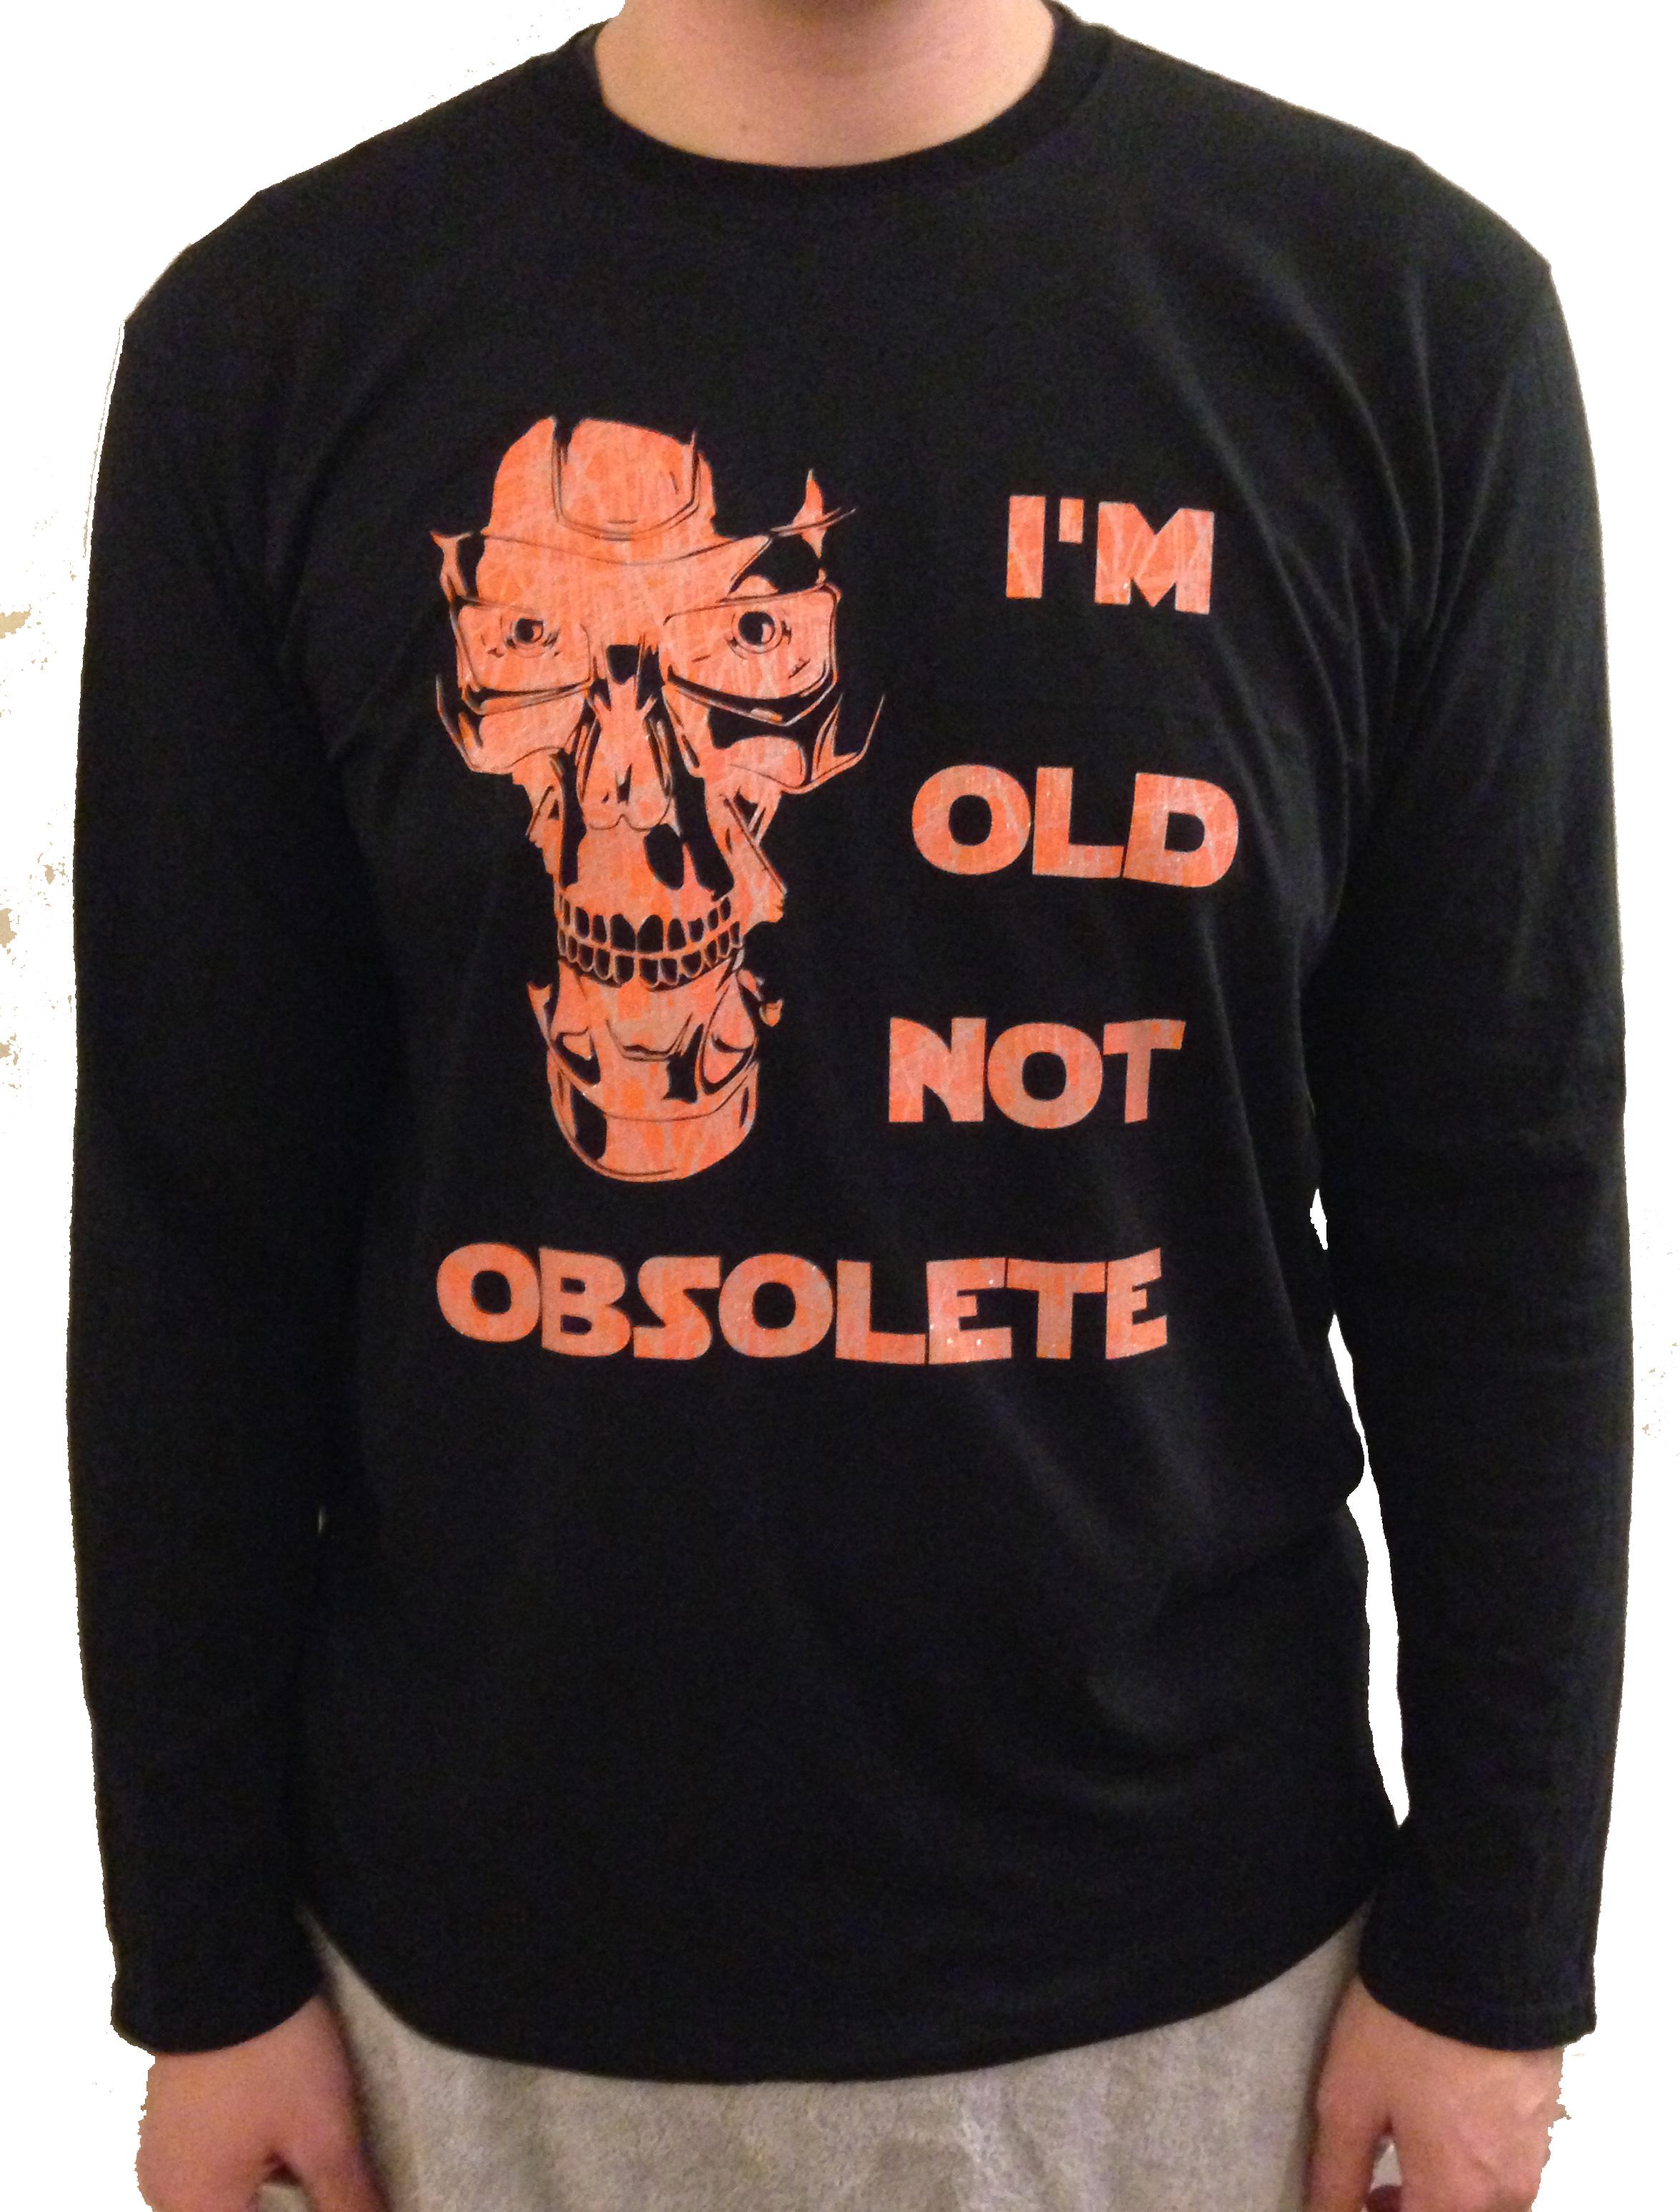 I'm Old not Obsolete